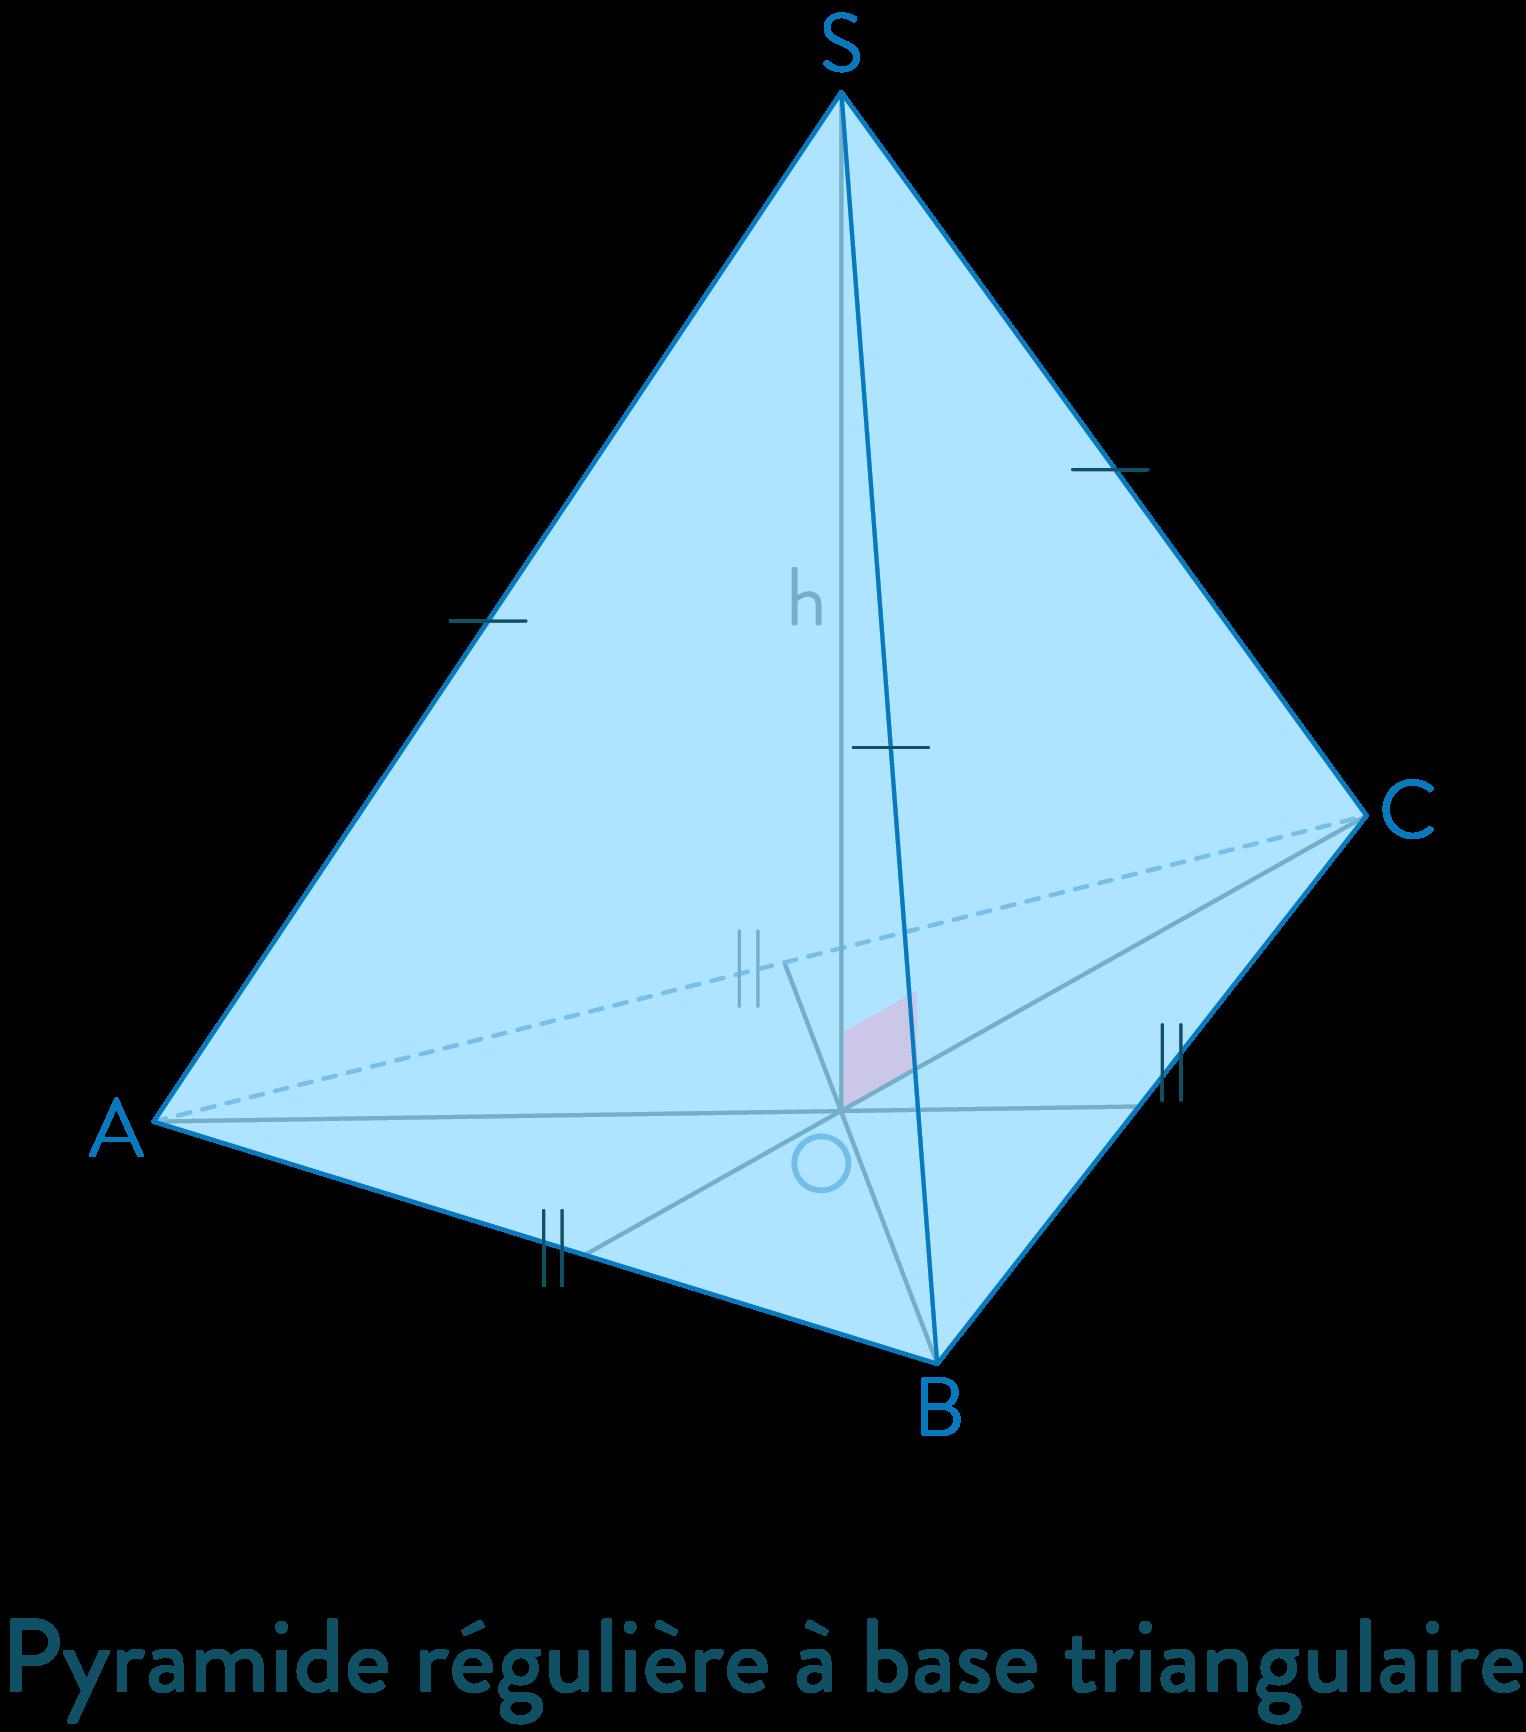 pyramide solides mathématiques cinquième